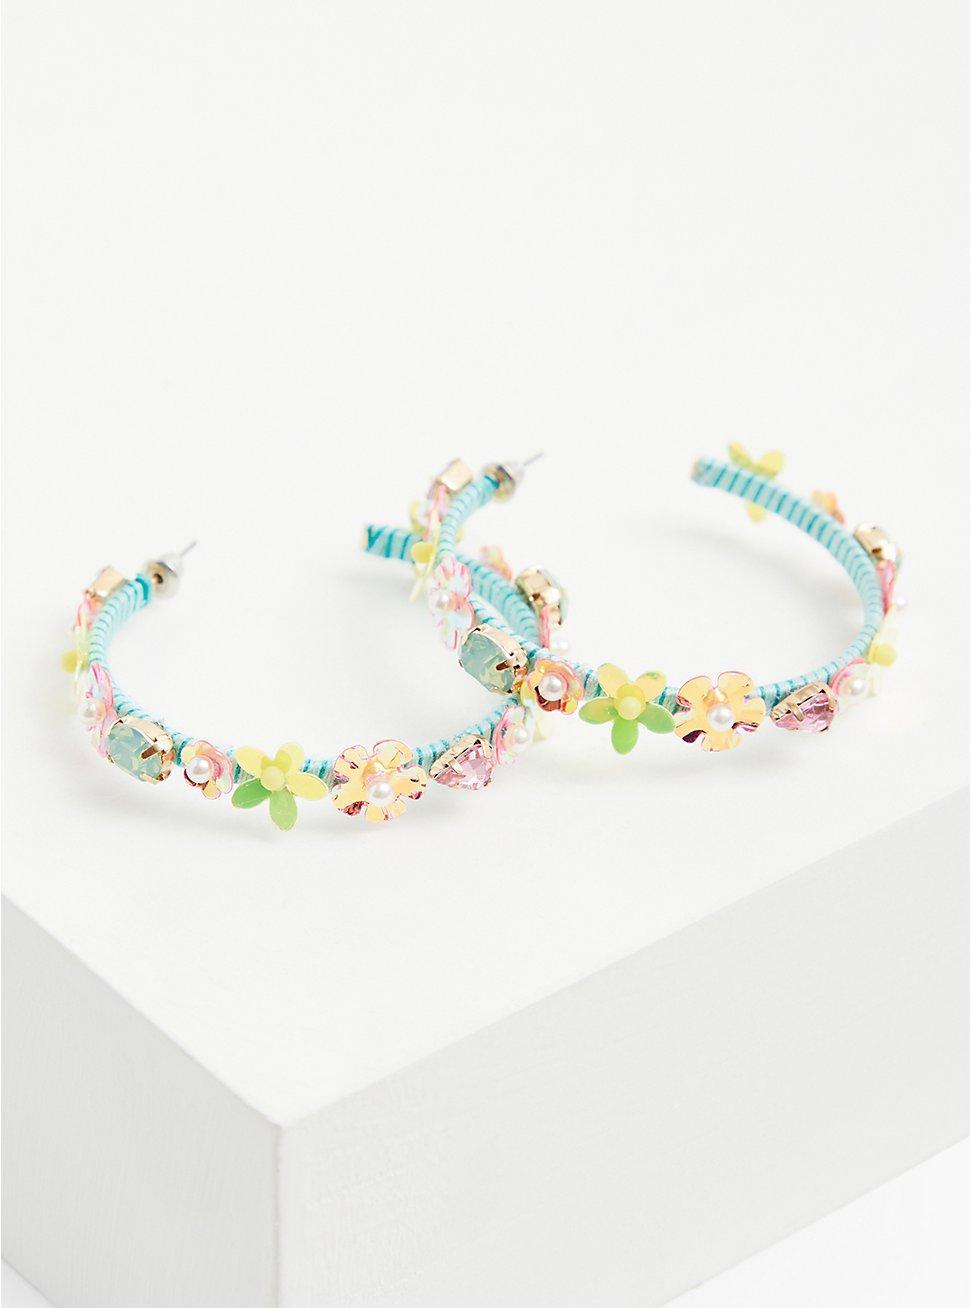 Turquoise & Iridescent Floral Hoop Earrings, , hi-res